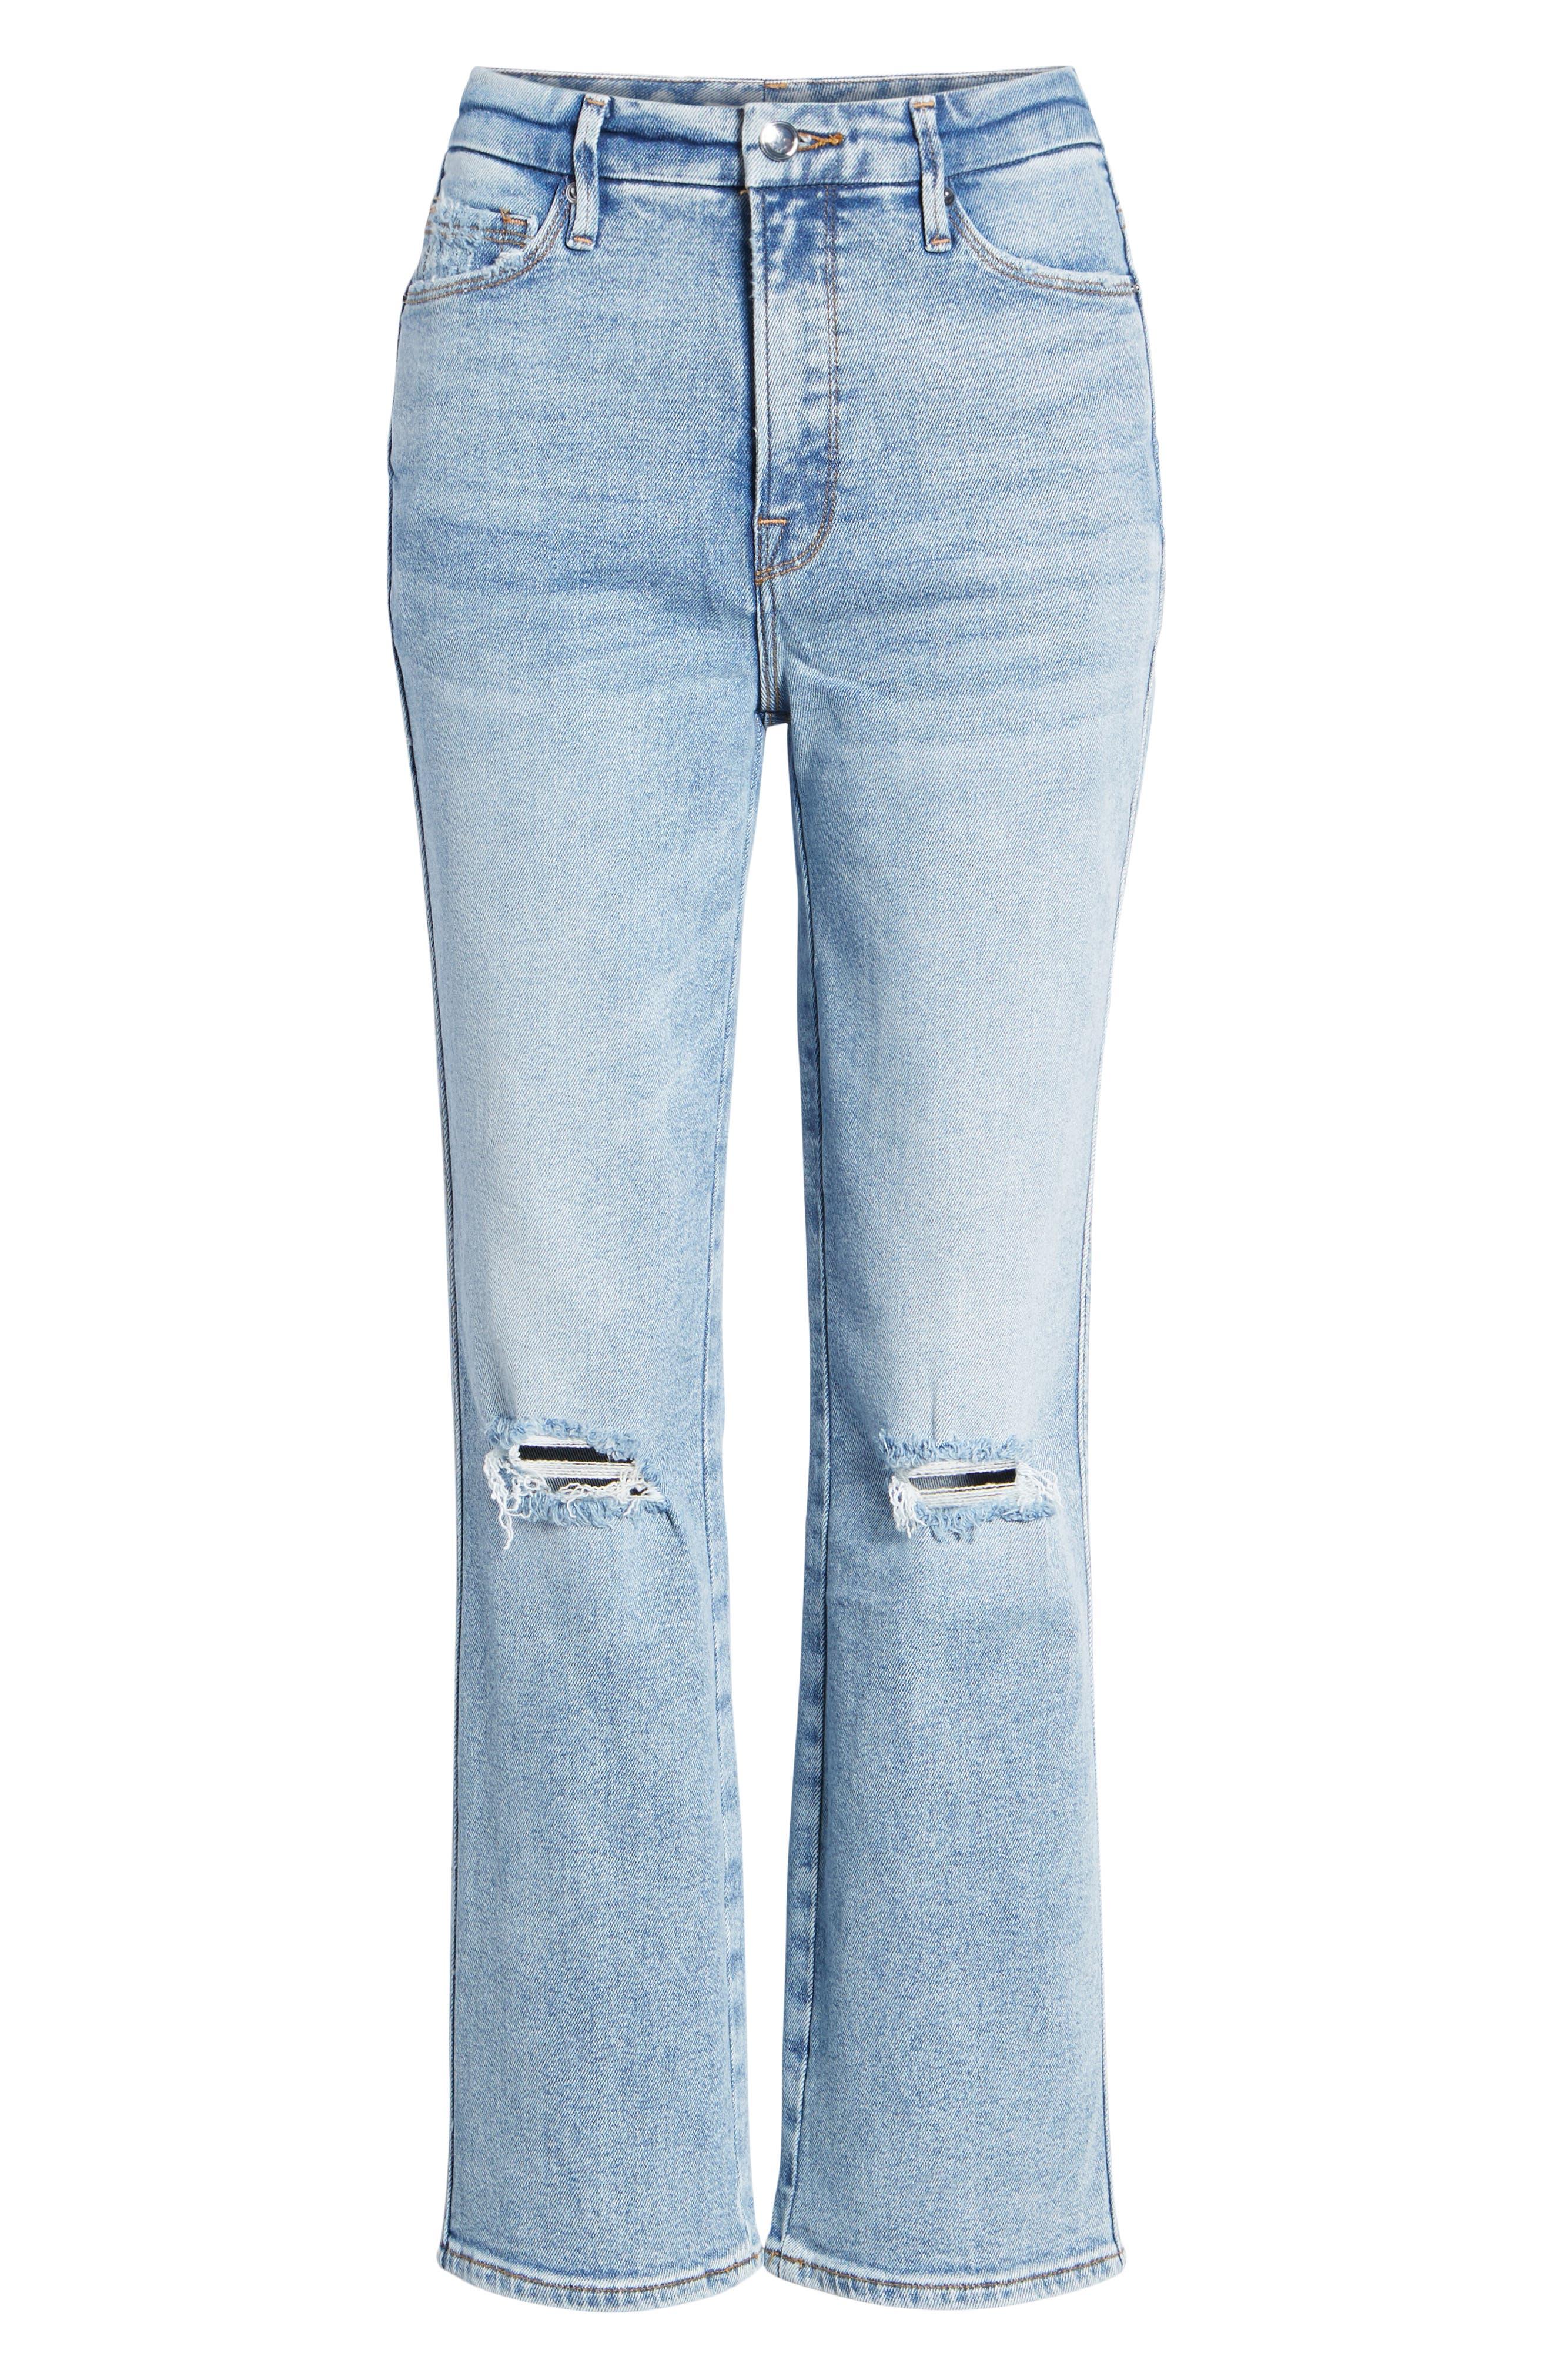 GOOD AMERICAN,                             Good Curve High Waist Ankle Straight Leg Jeans,                             Alternate thumbnail 6, color,                             BLUE 189